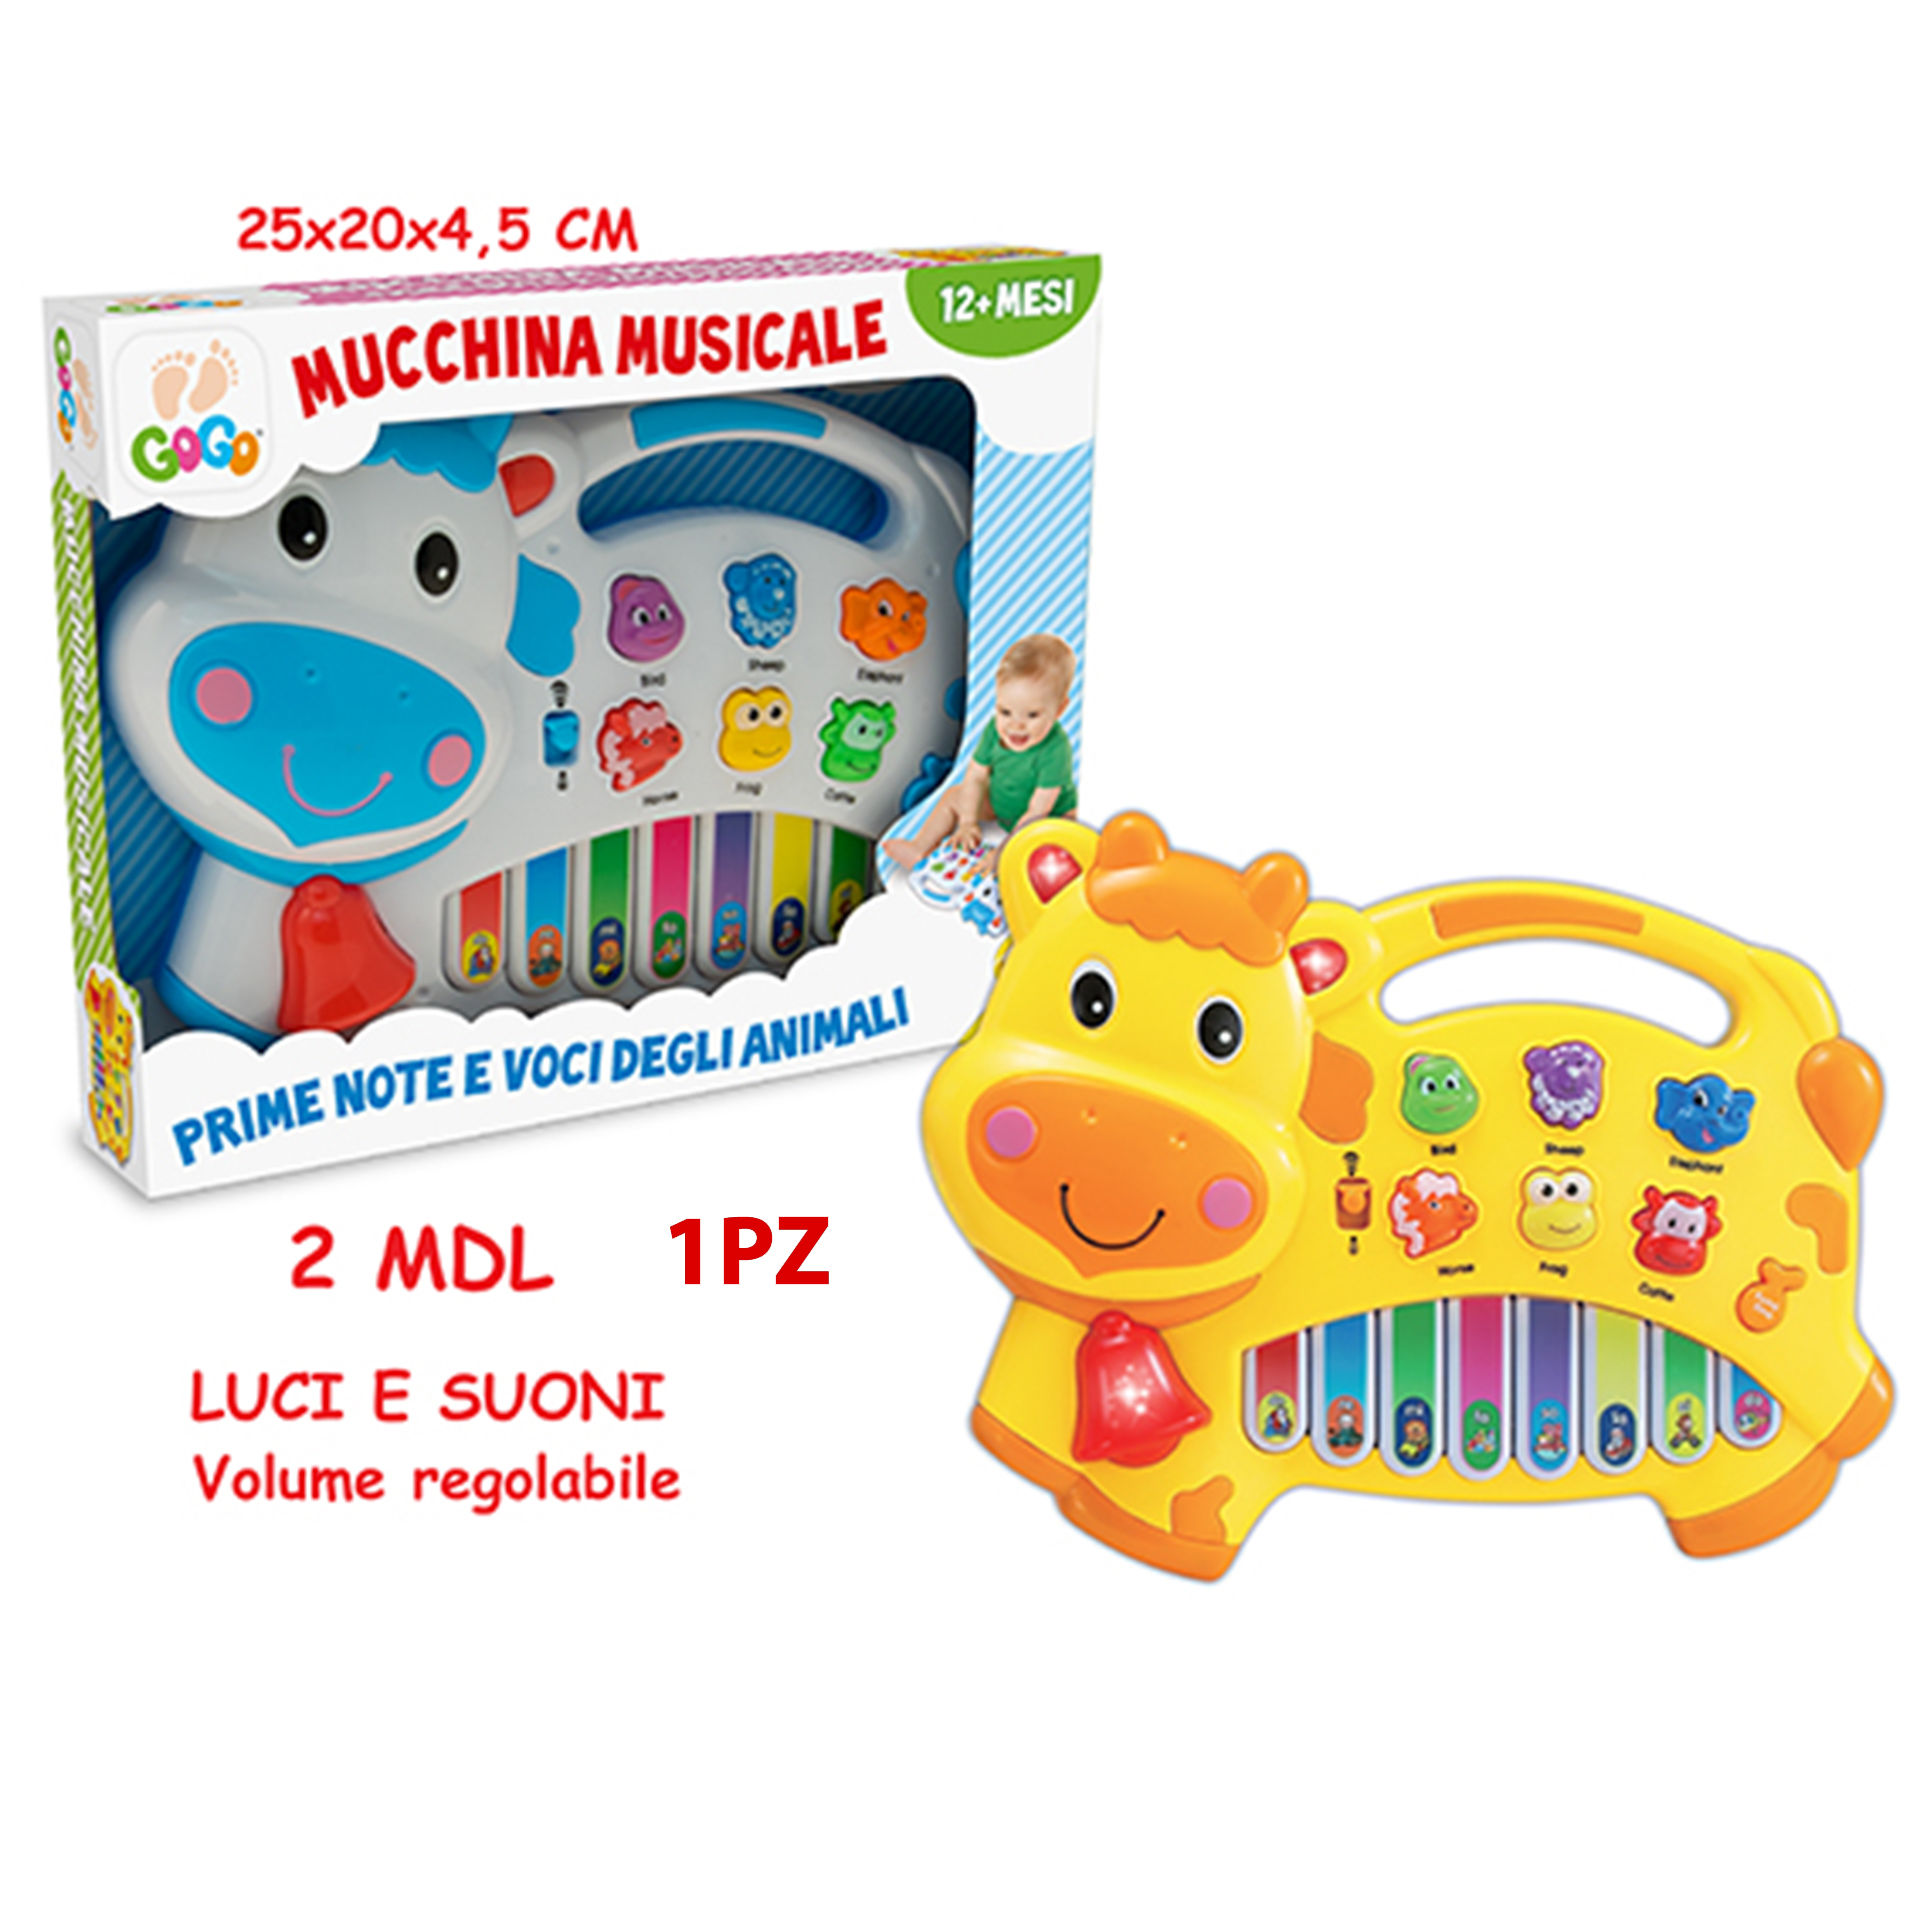 GOGO - PIANOLA MUSICALE MUCCA 2 ASSTeorema